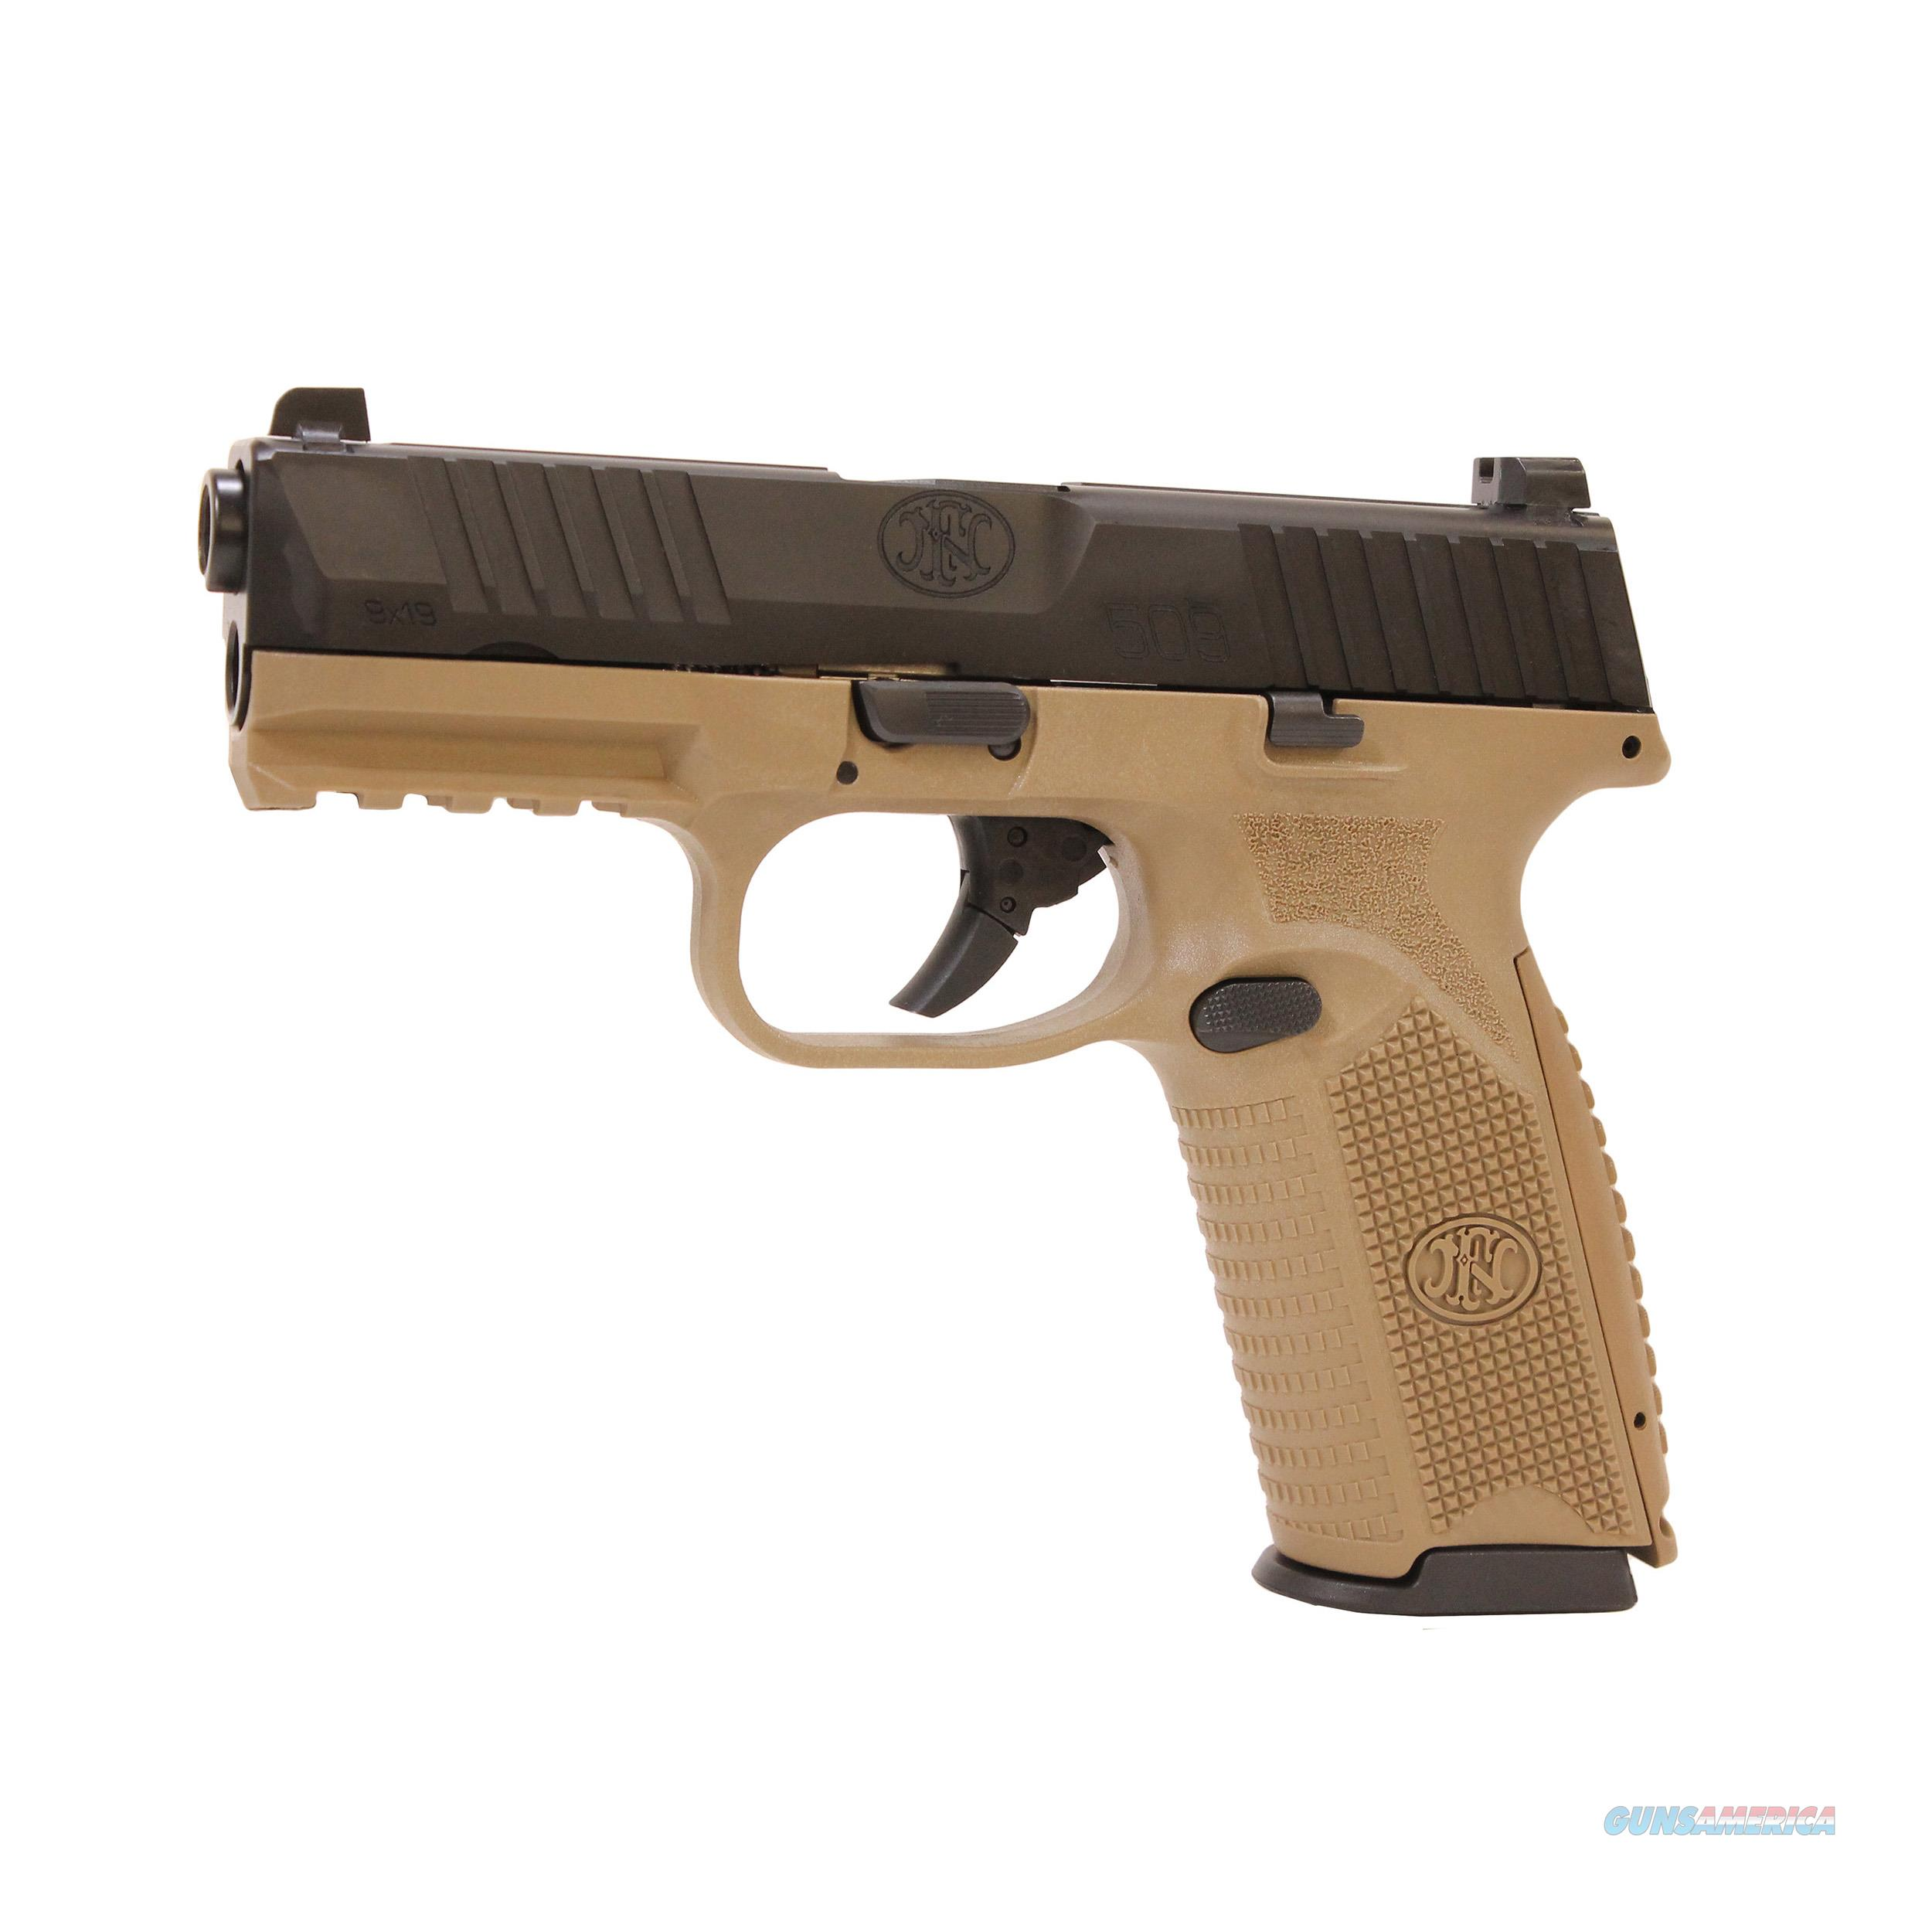 "FN FN-509 9mm FDE 17+1 4"" Layaway NoCCFee 66100357  Guns > Pistols > FNH - Fabrique Nationale (FN) Pistols > FN 509"